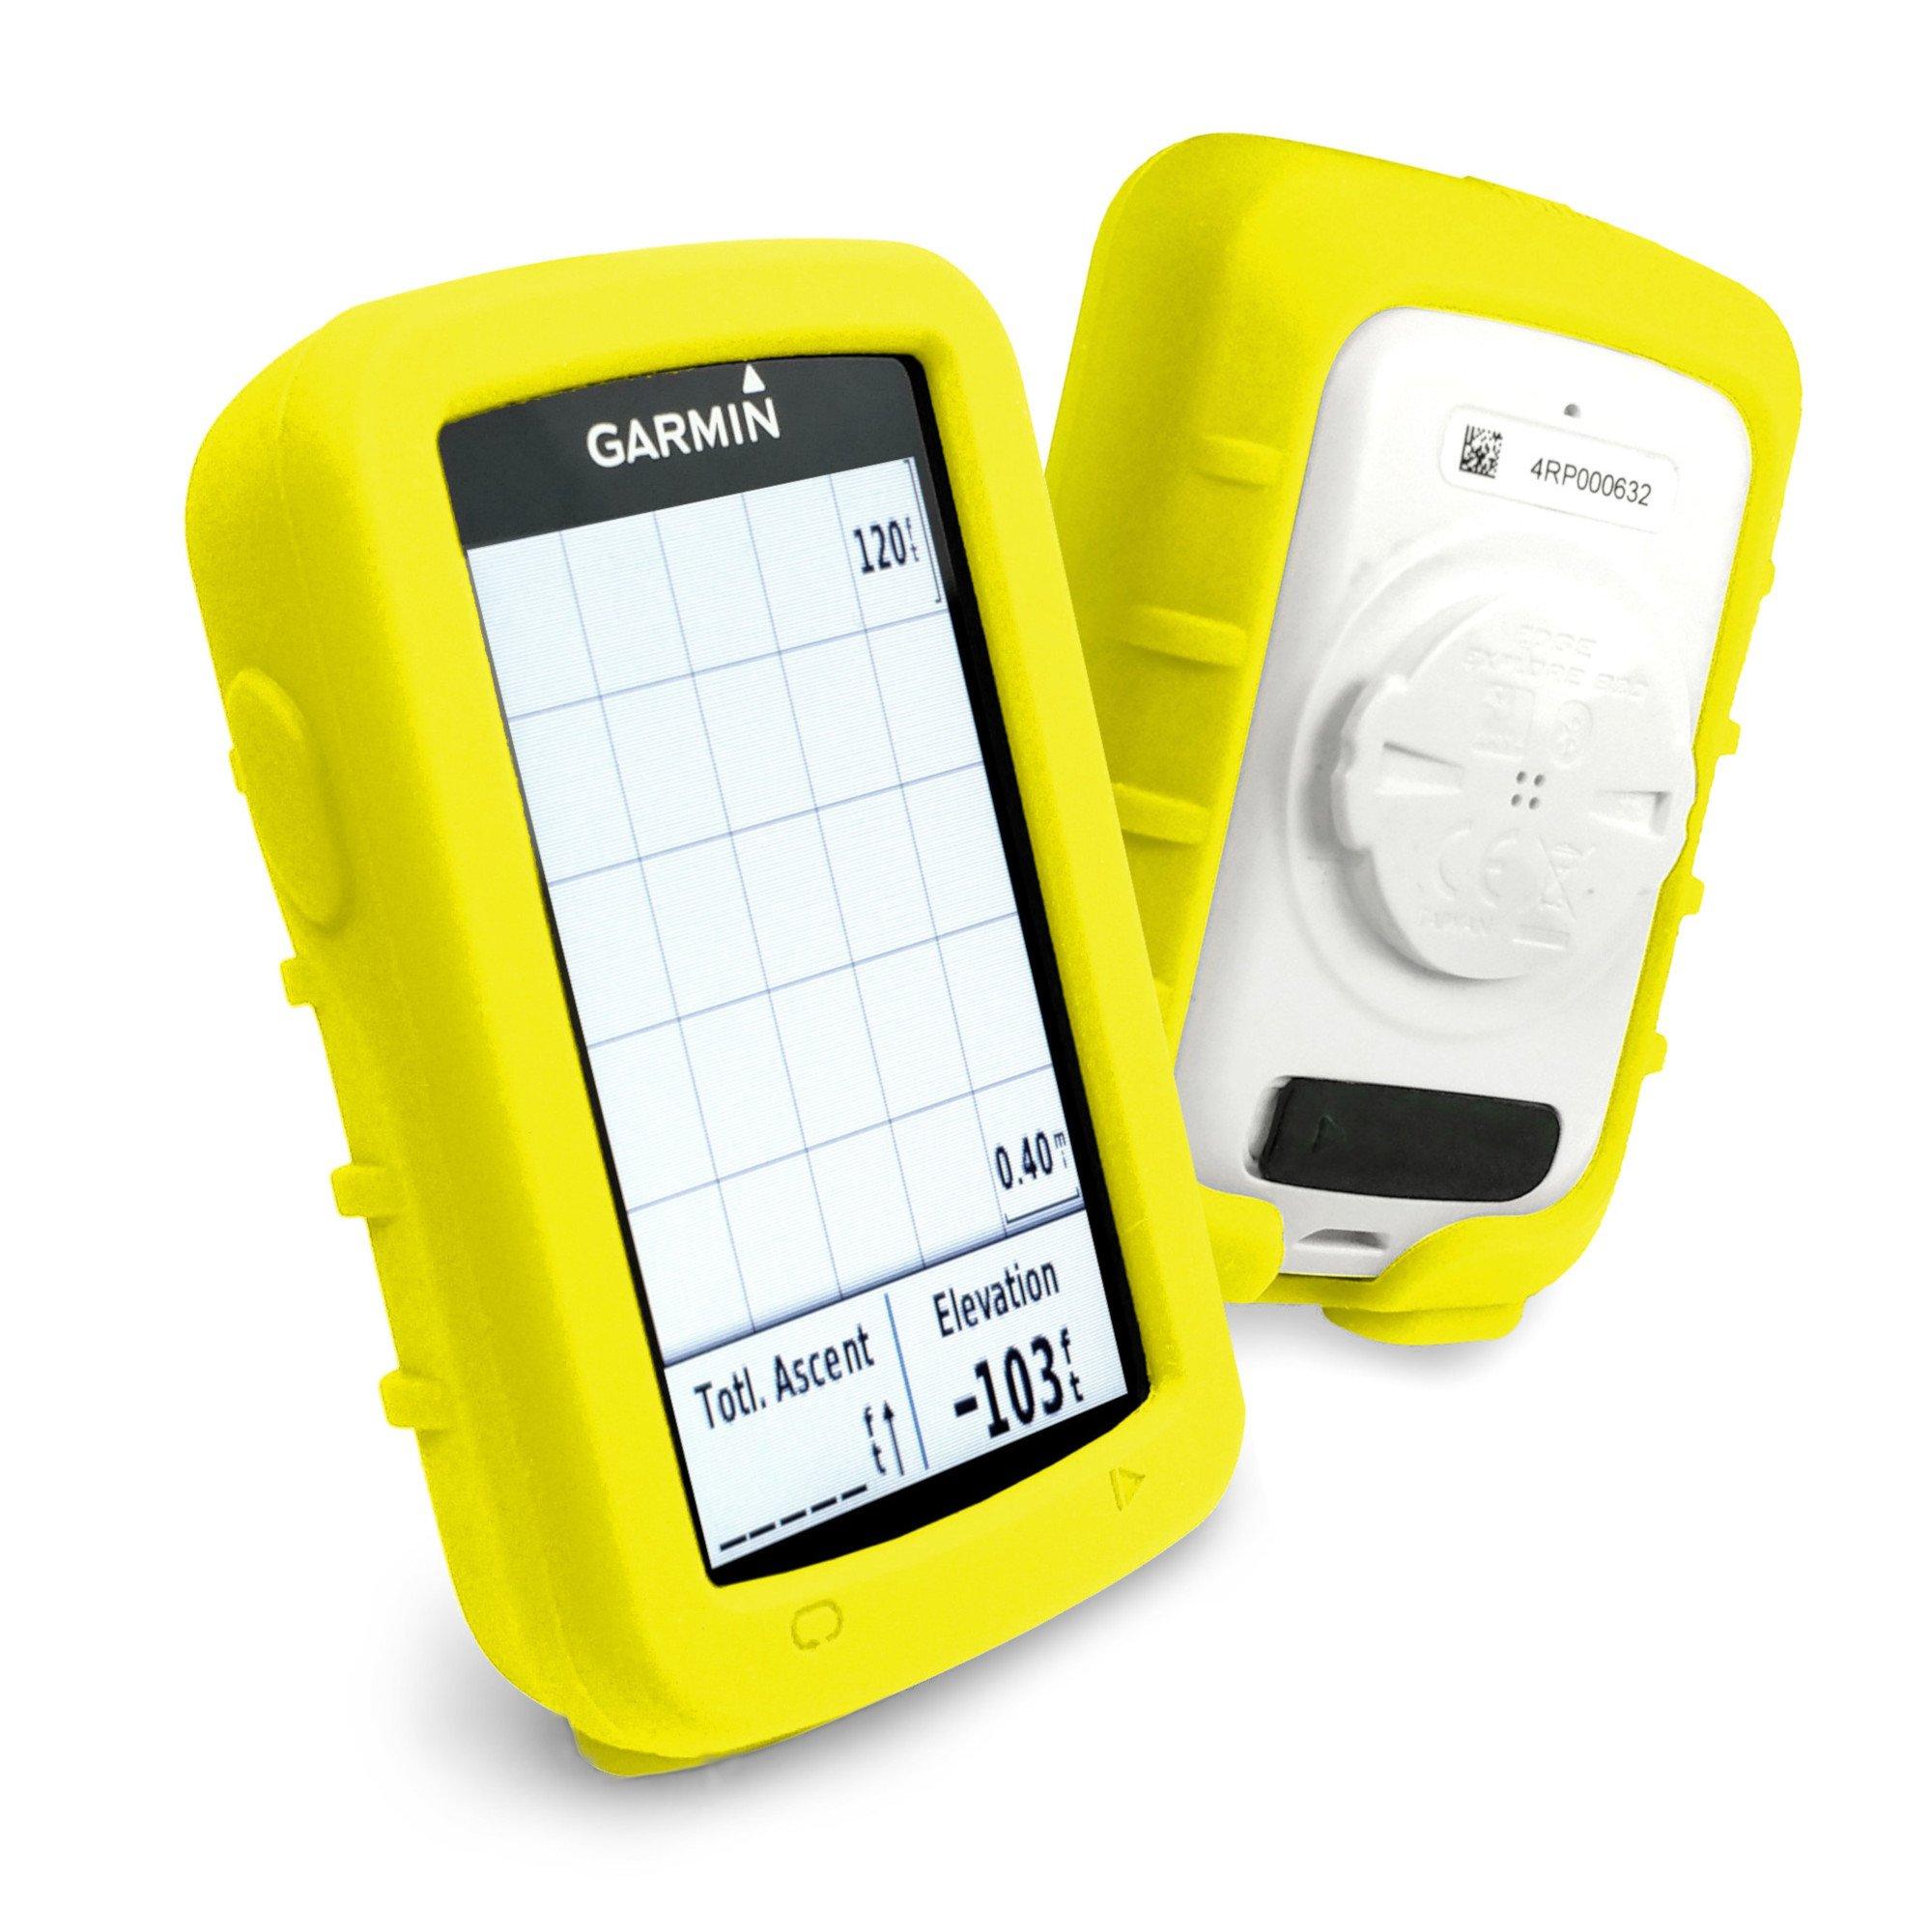 Tuff-luv Silicone Gel Skin Case and Screen Cover for Garmin Edge Explore 820 - Yellow